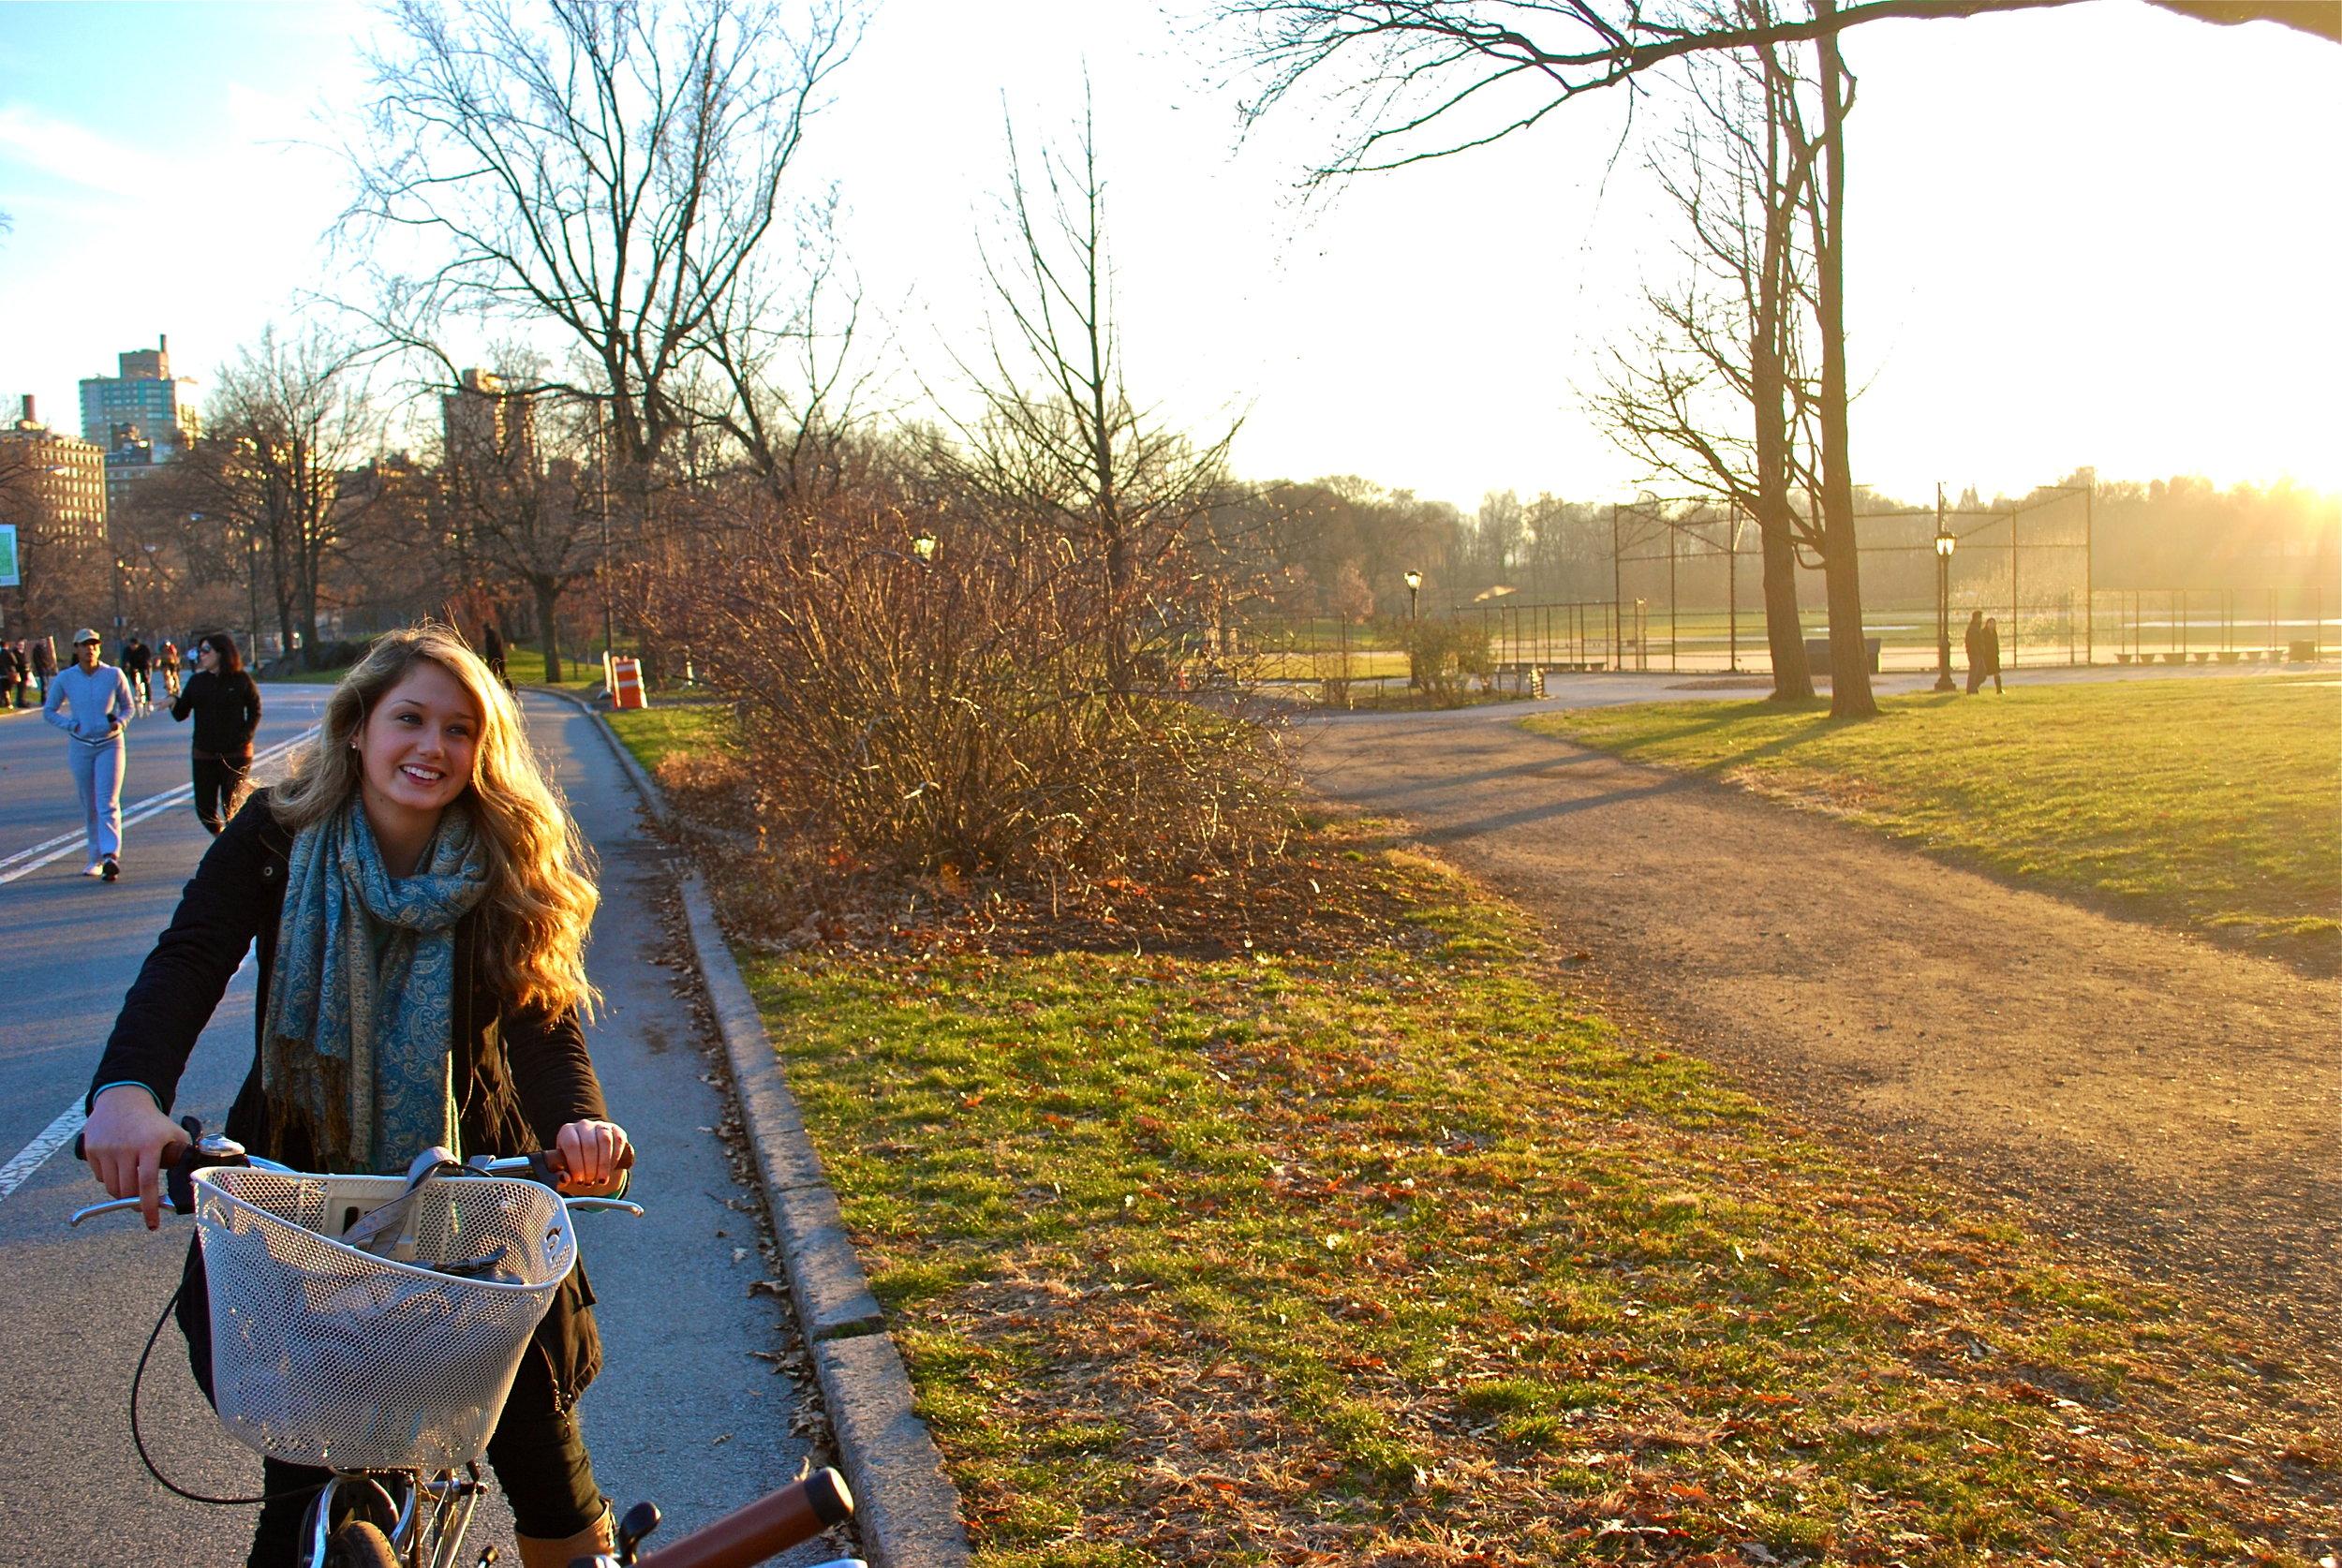 Kaci Nicole - NYE in NYC - Bike Ride in Central Park